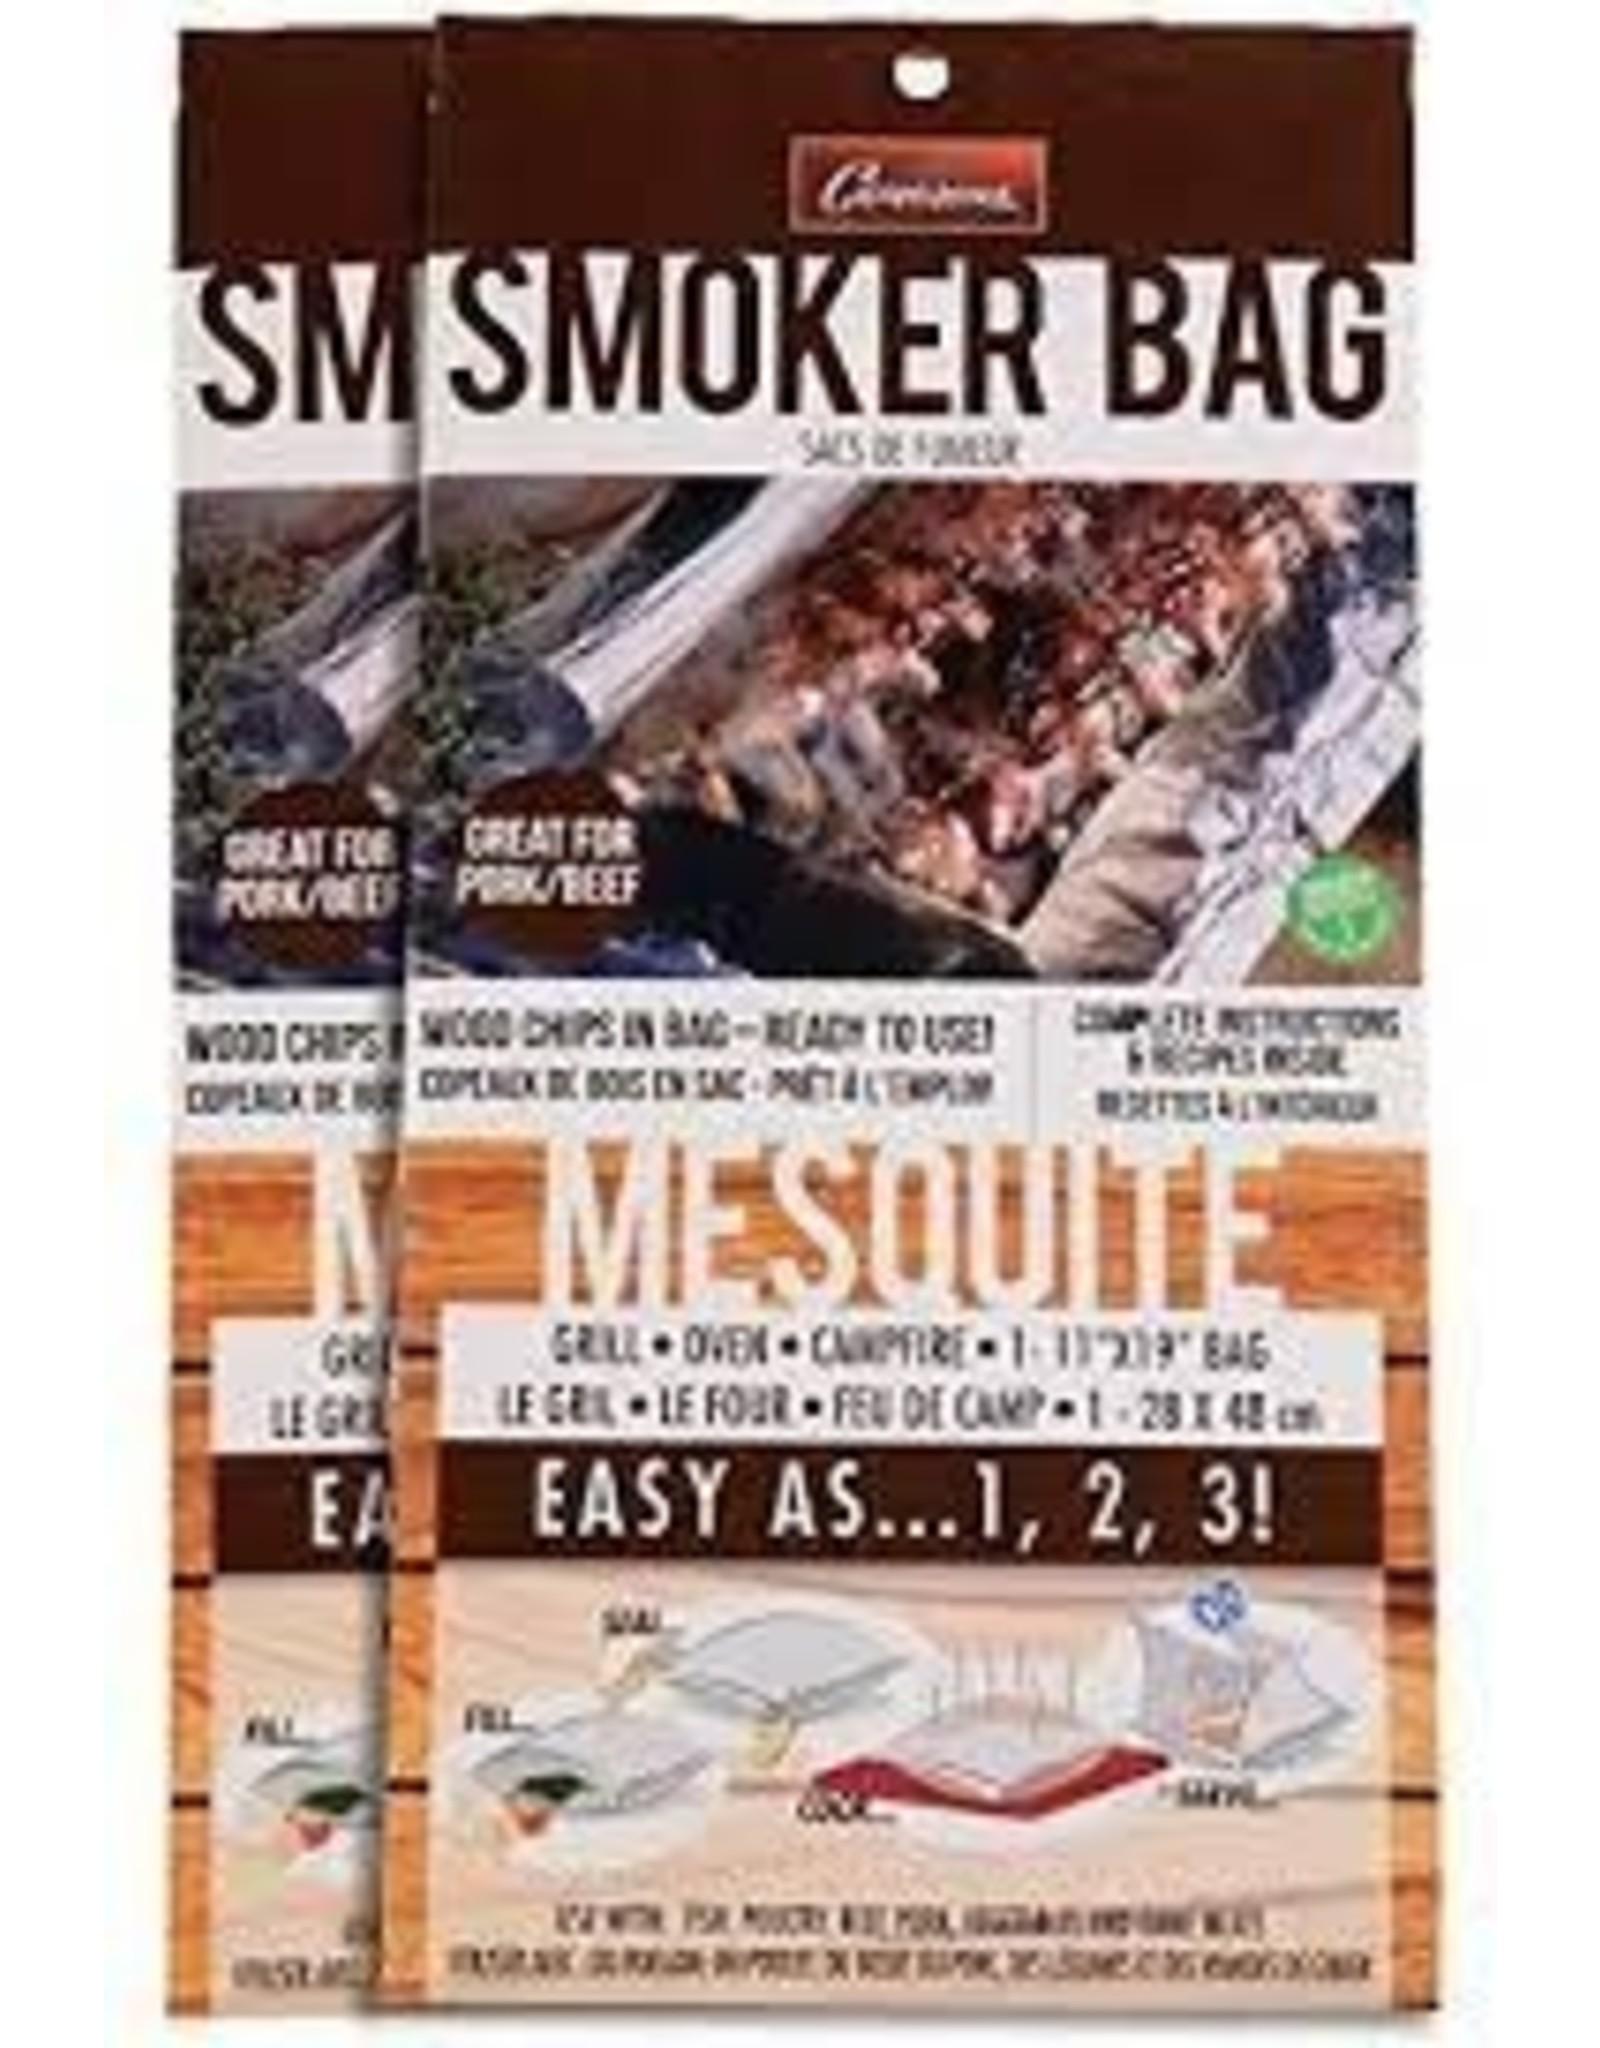 "Cameron CAMERON- Smoker Bag Mesquite (Measures 17"" x 12"")"